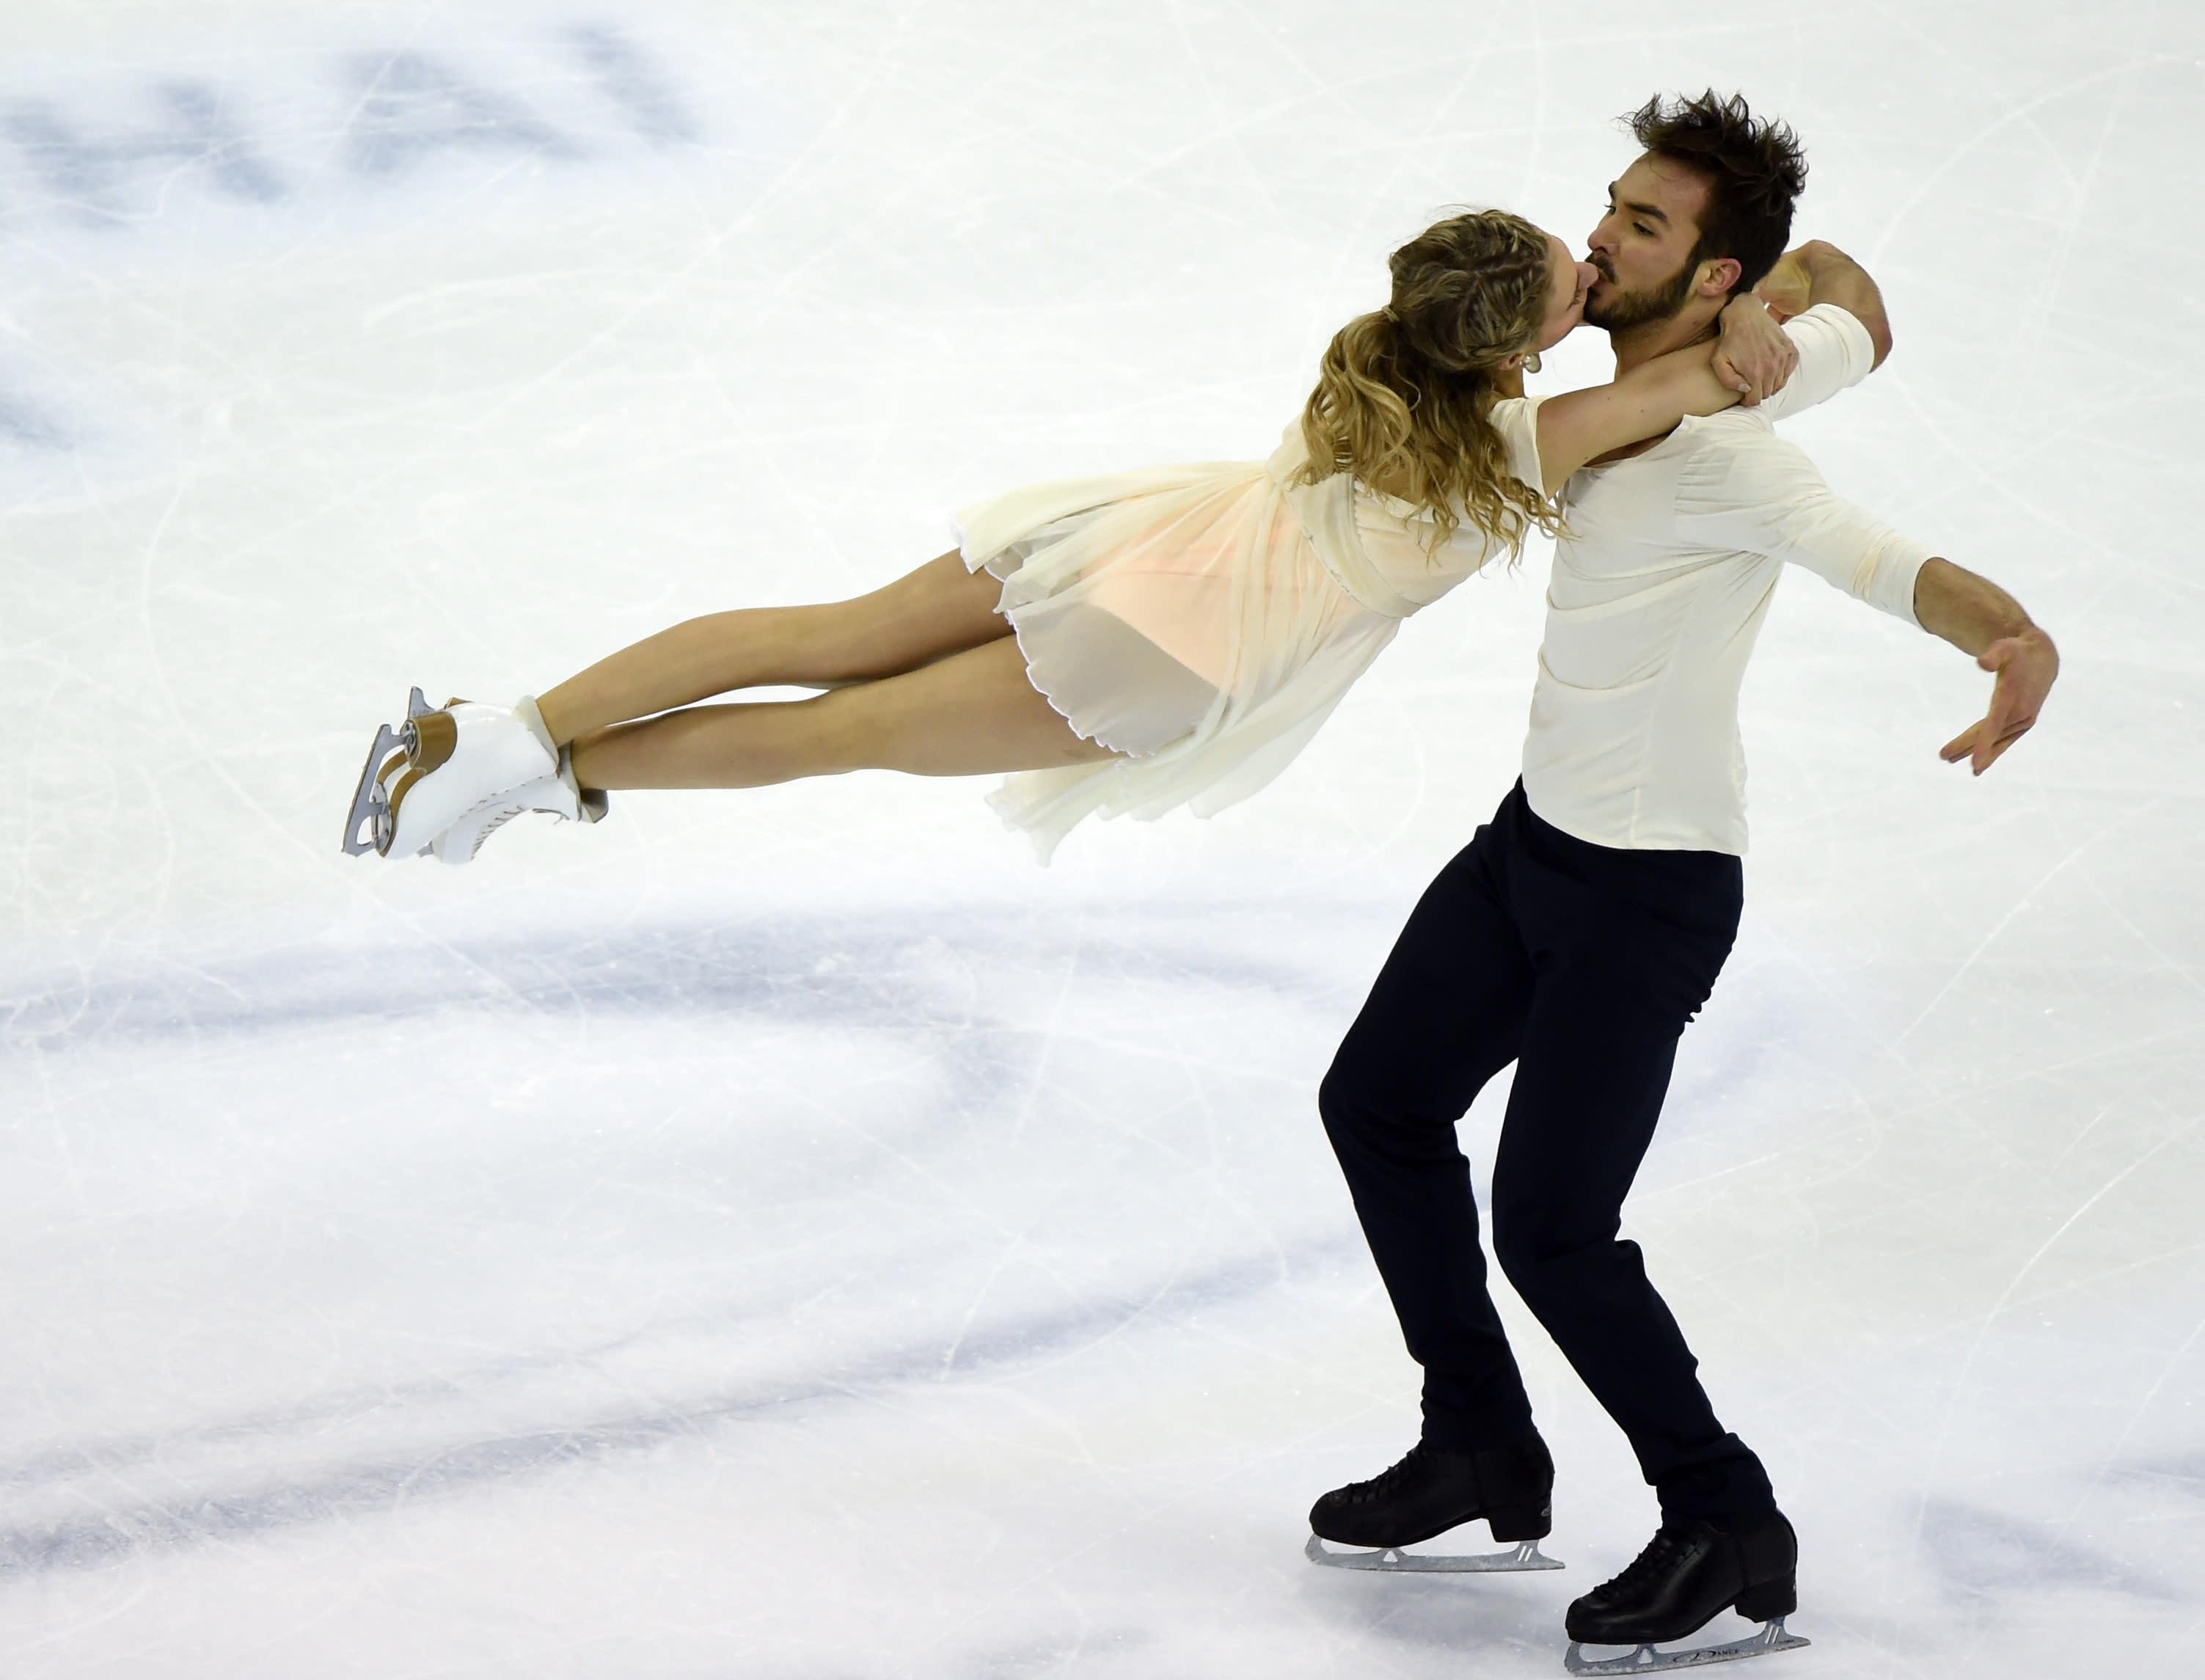 Figure skating - Papadakis, Cizeron clinch world ice dance gold